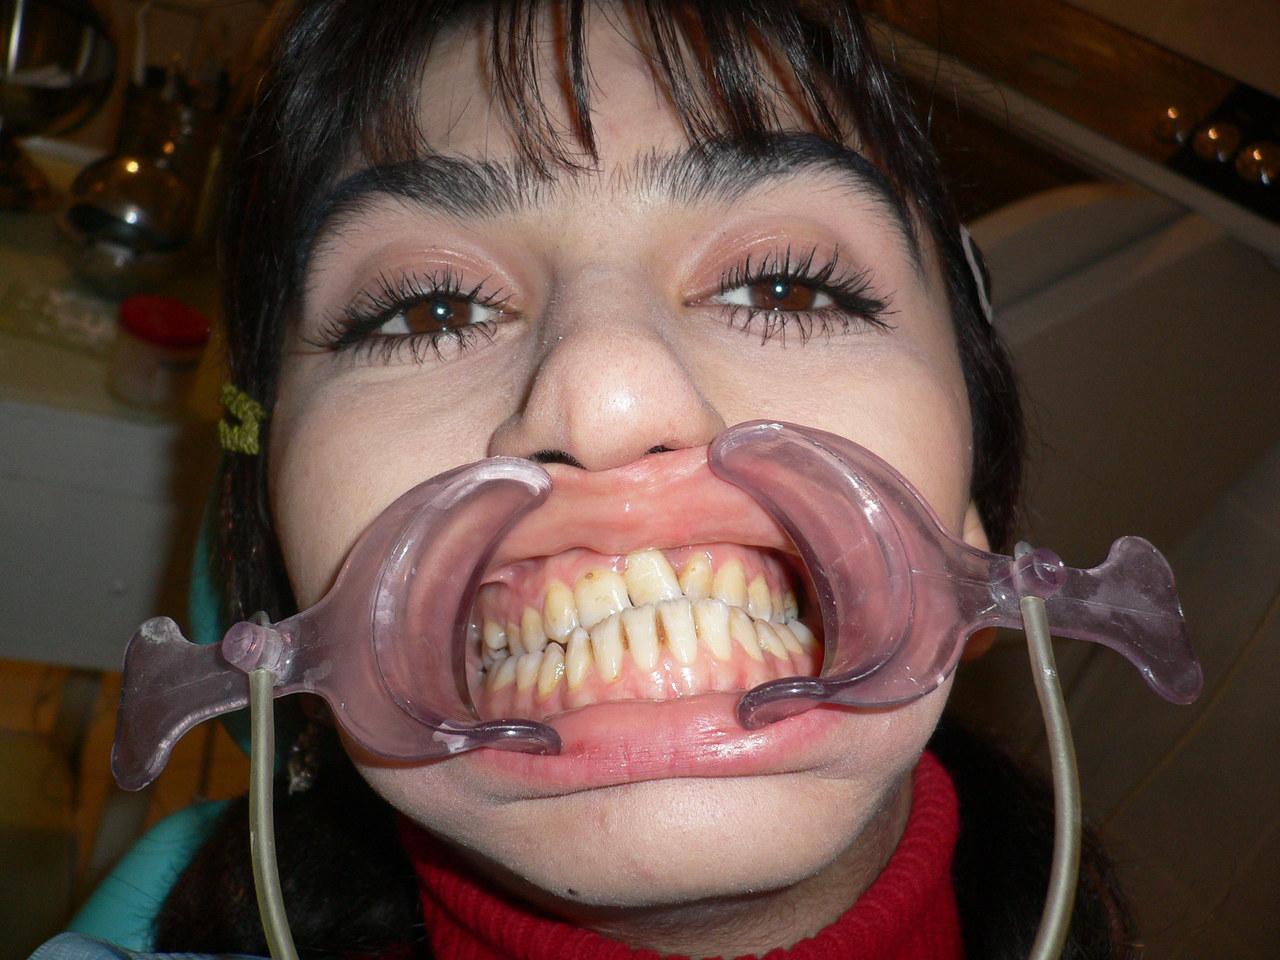 Рис. 1. Внешний вид пациентки с микрогнатией верхней челюсти (вид спереди).